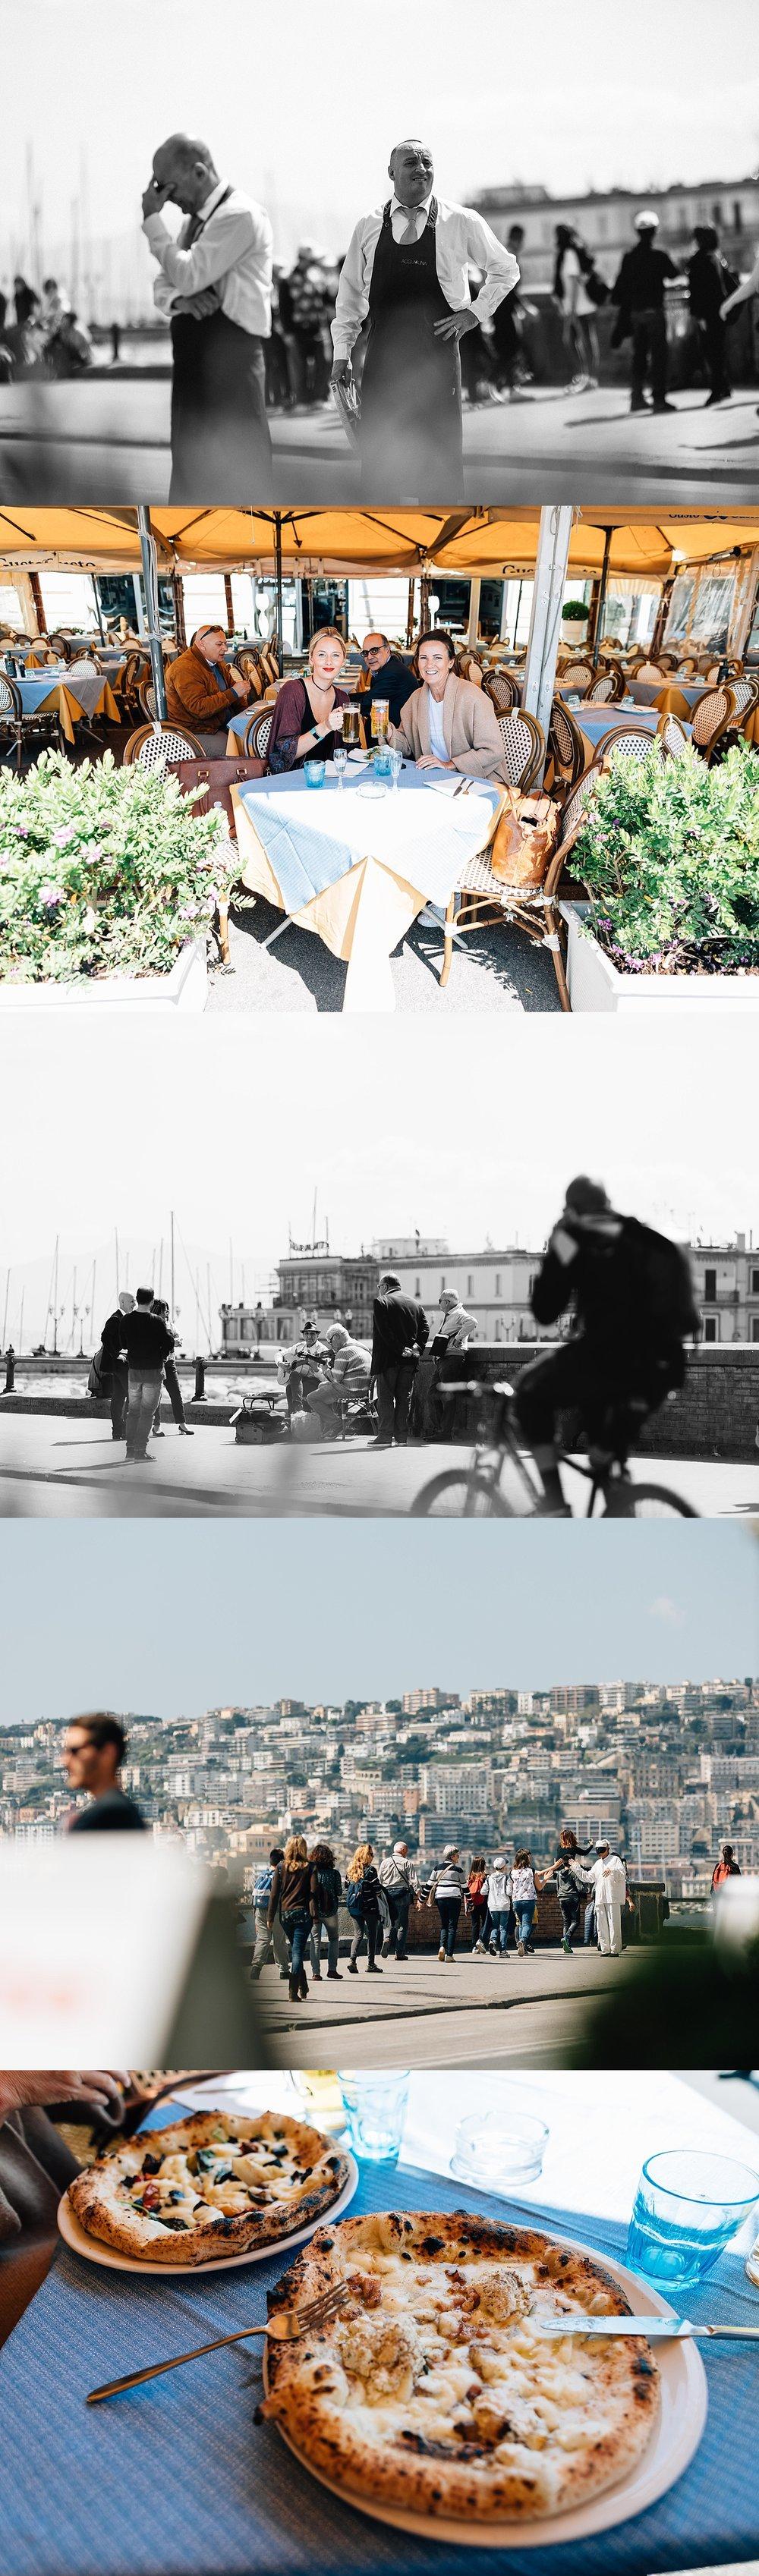 Acquolina, Napoli